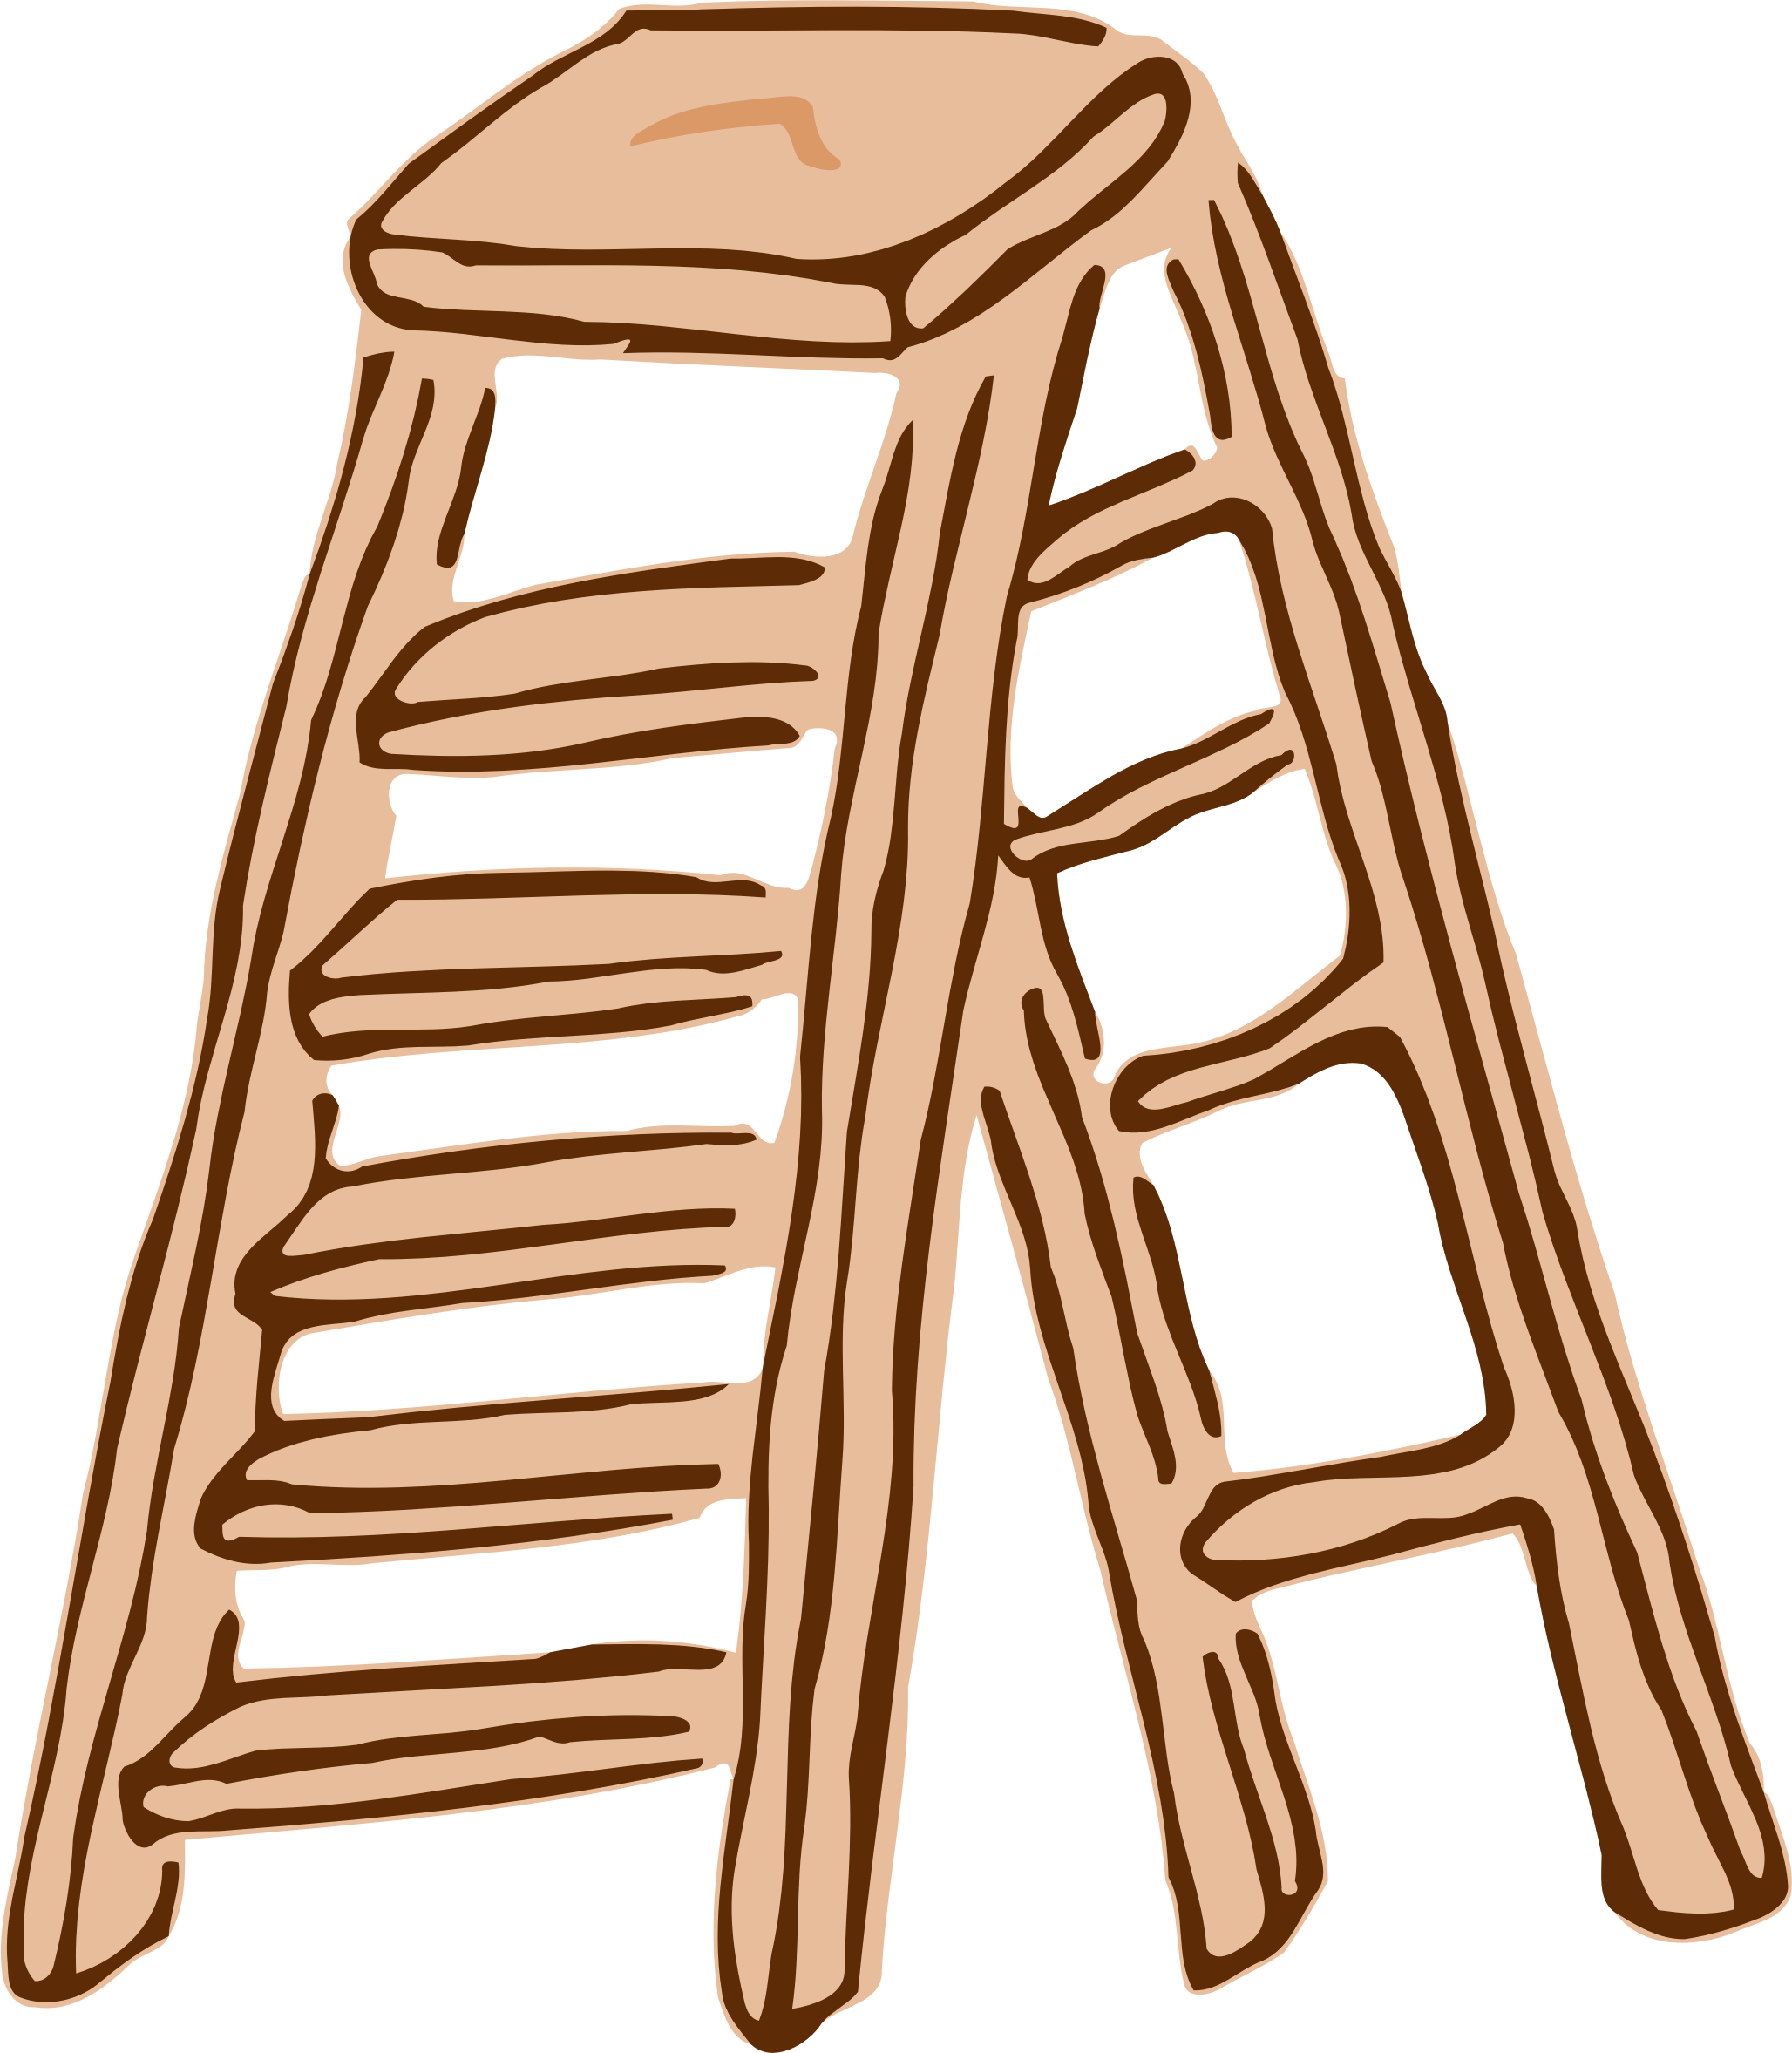 Roughly drawn stepladder big. Ladder clipart step stool